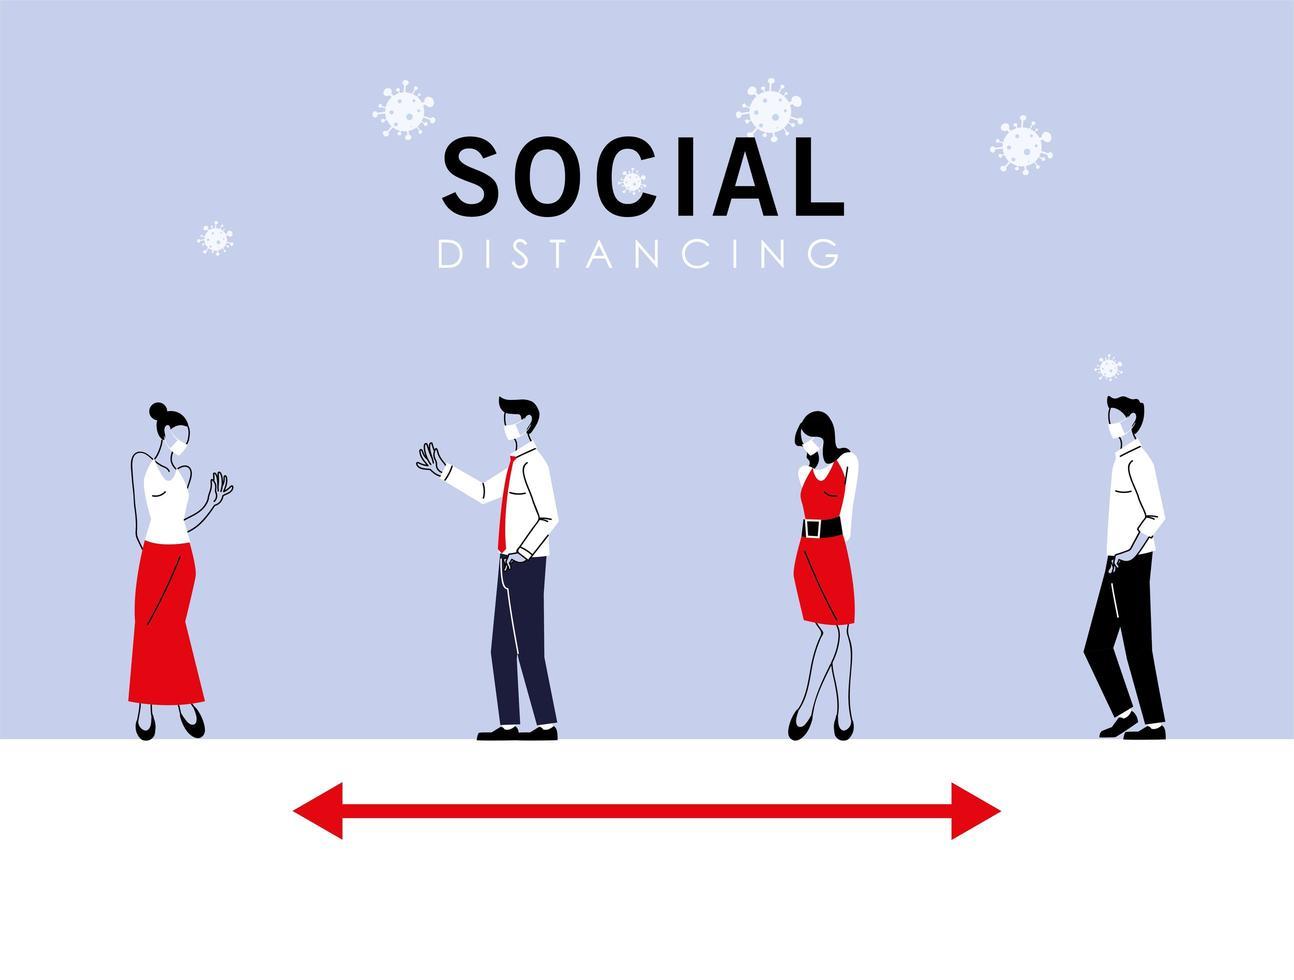 Social distancing between women and men with masks vector